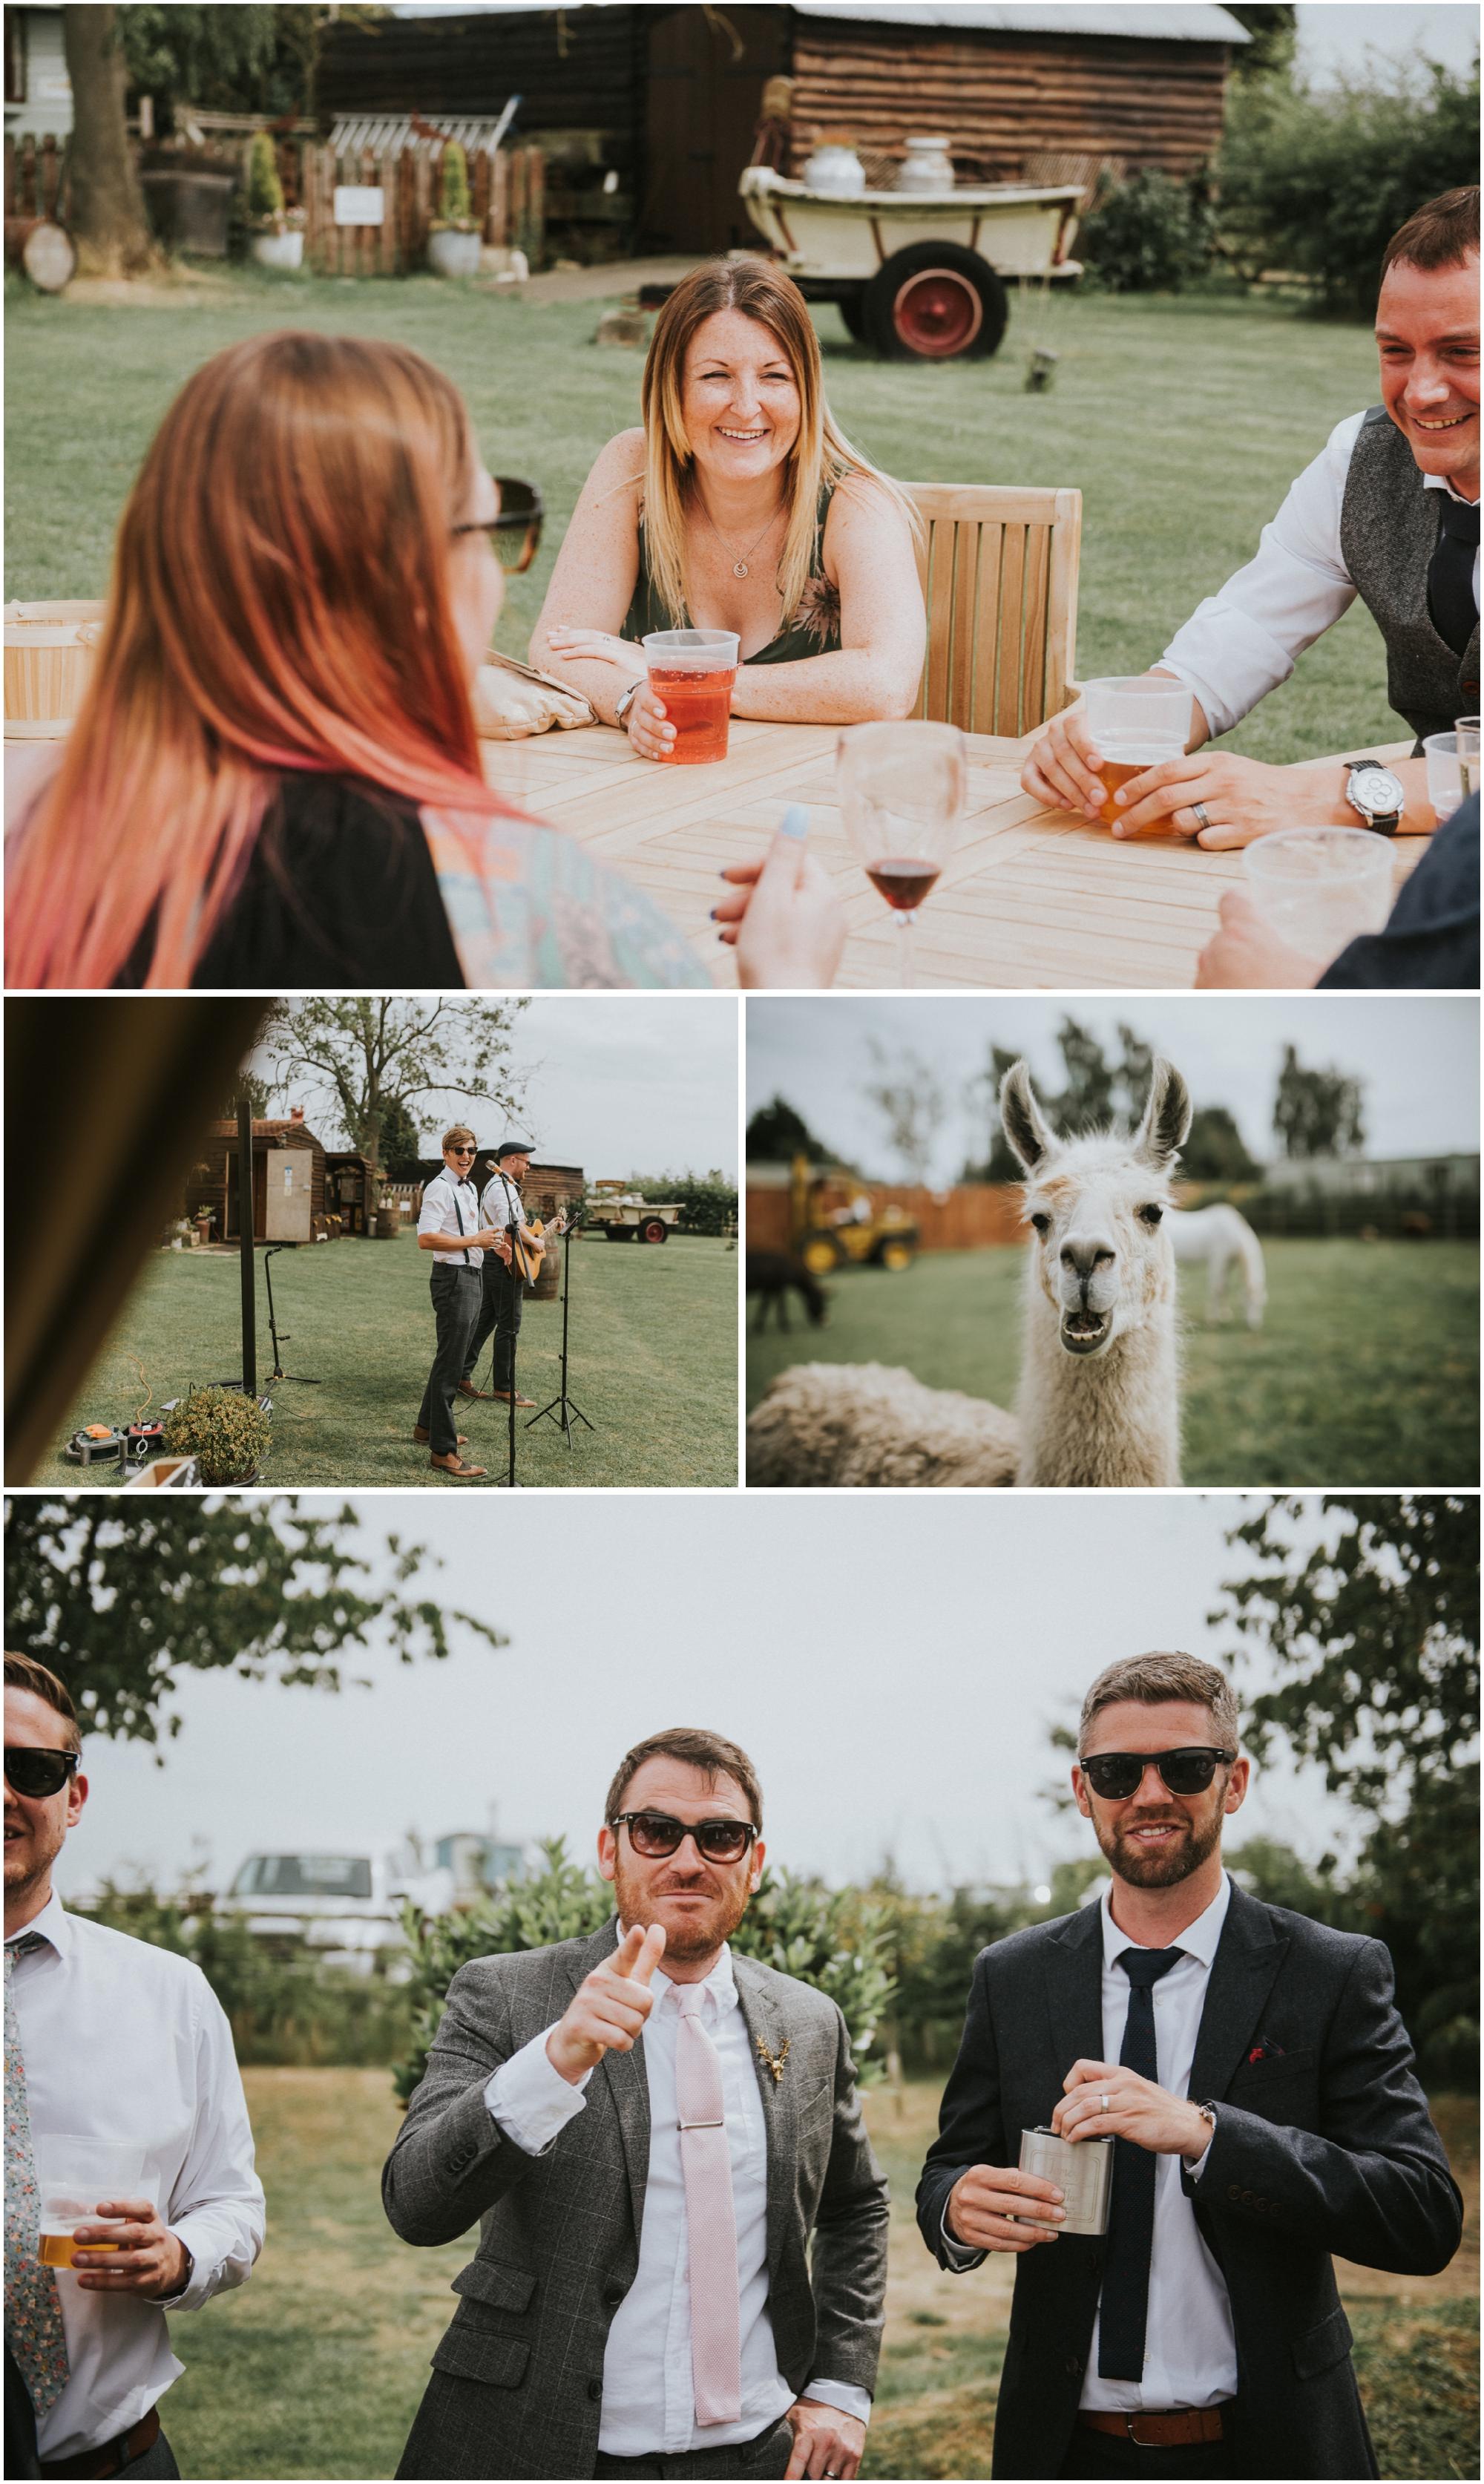 SkipbridegFarmWedding-LukeHolroyd-Yorkshirewedding_0077.jpg